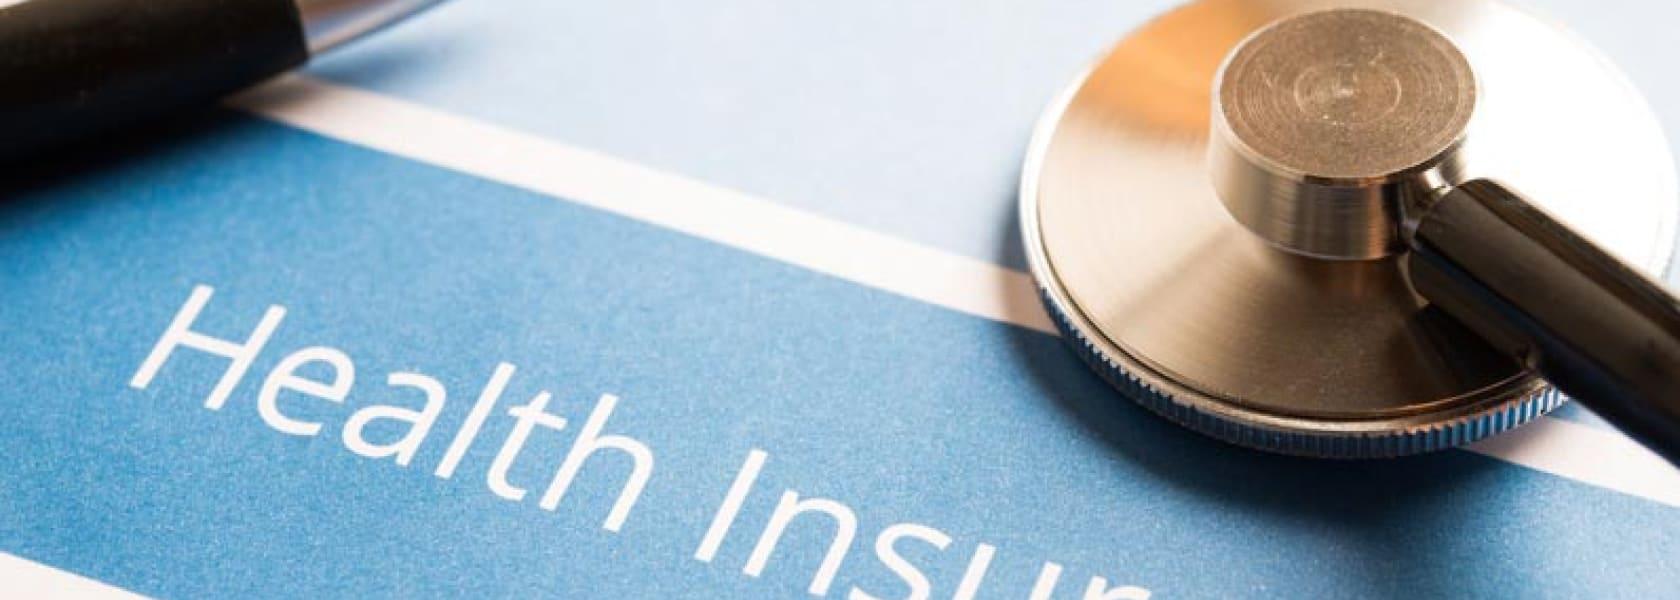 Health & Life Insurance image